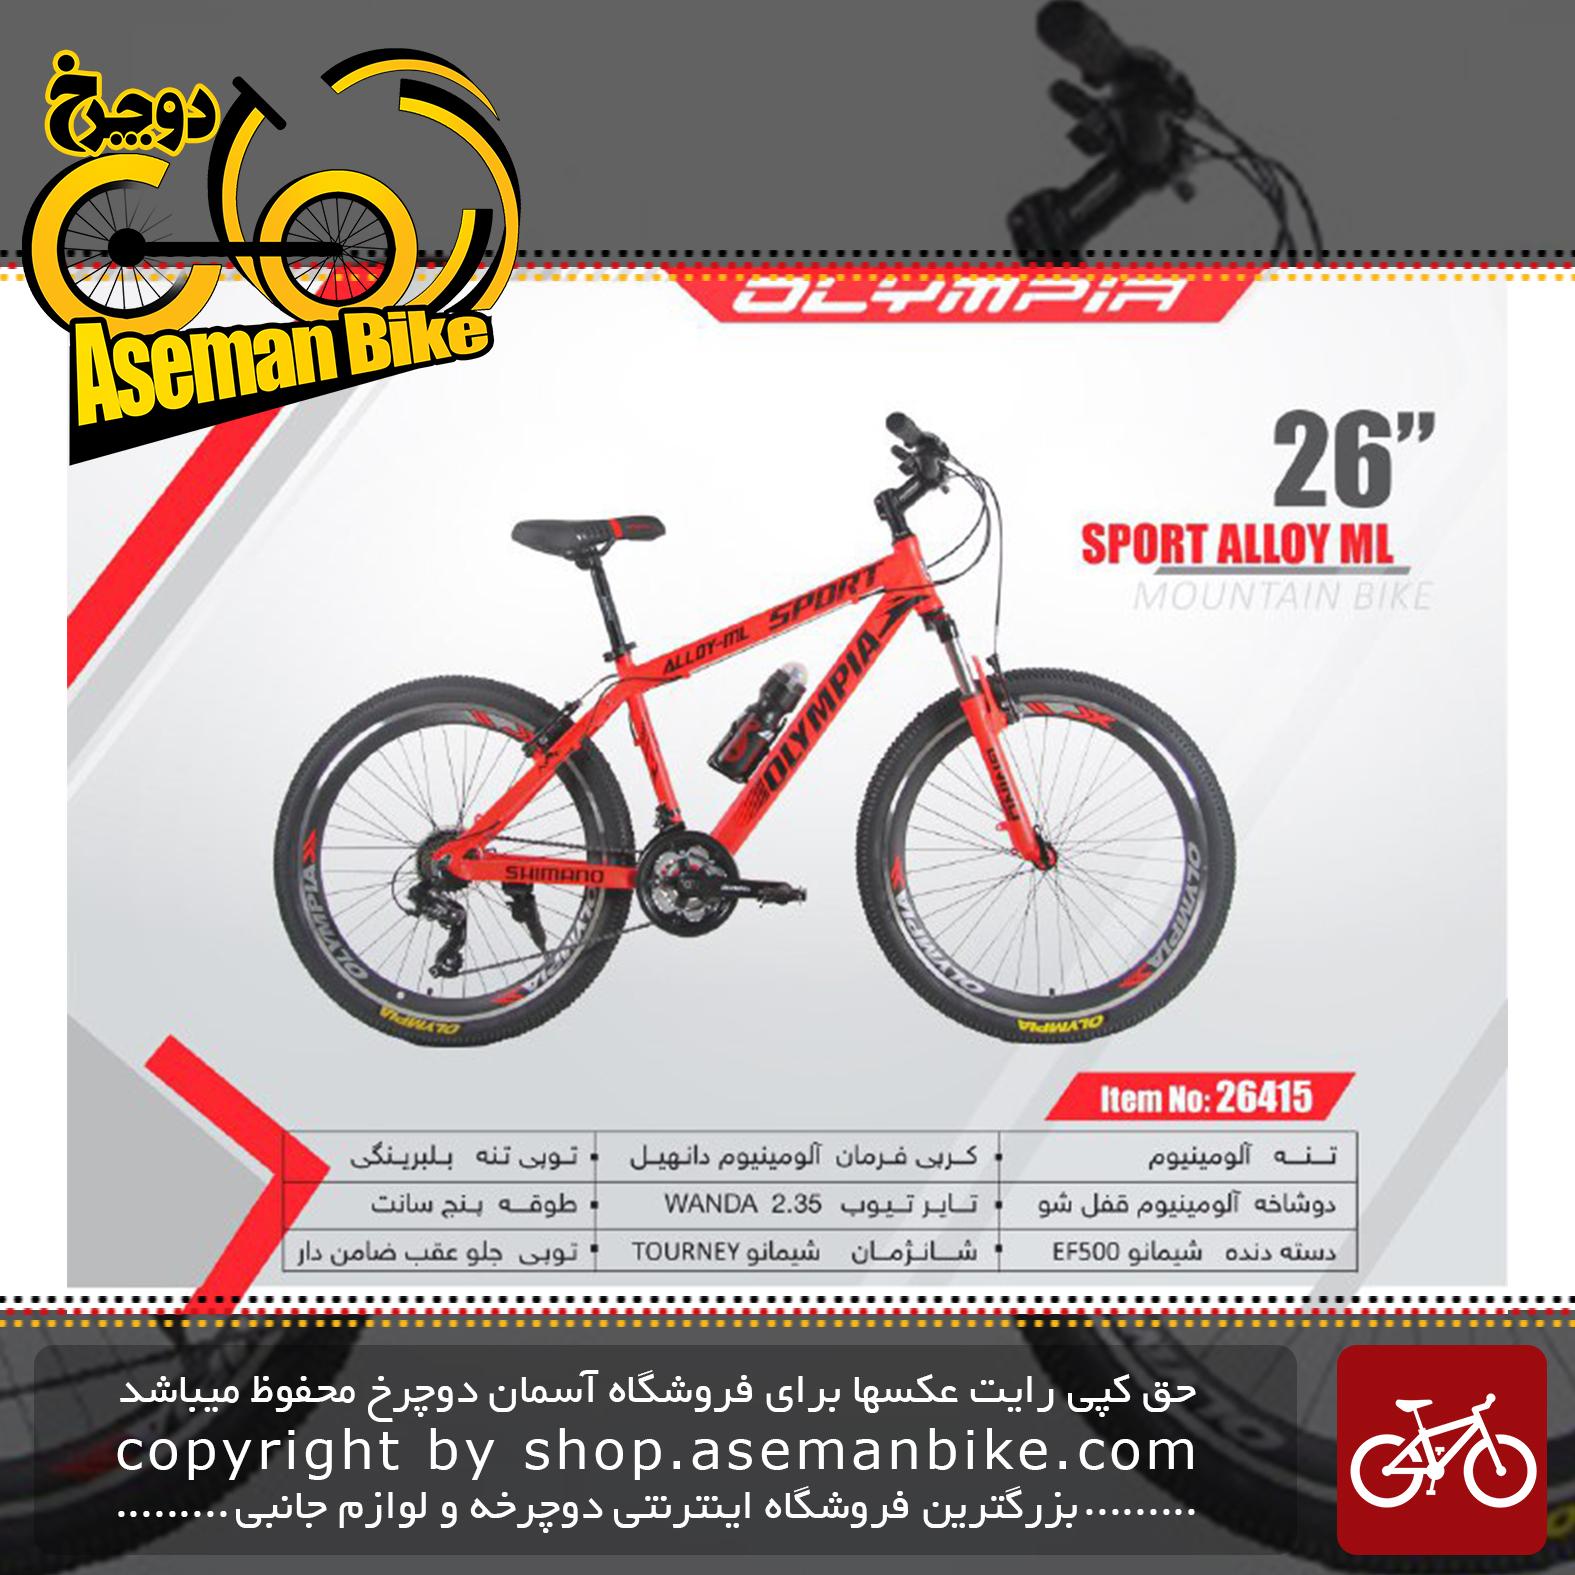 دوچرخه کوهستان المپیا سایز 26مدل اسپرت الوی ام ال OLYMPIA SIZE 26 SPORT ALLOY ML